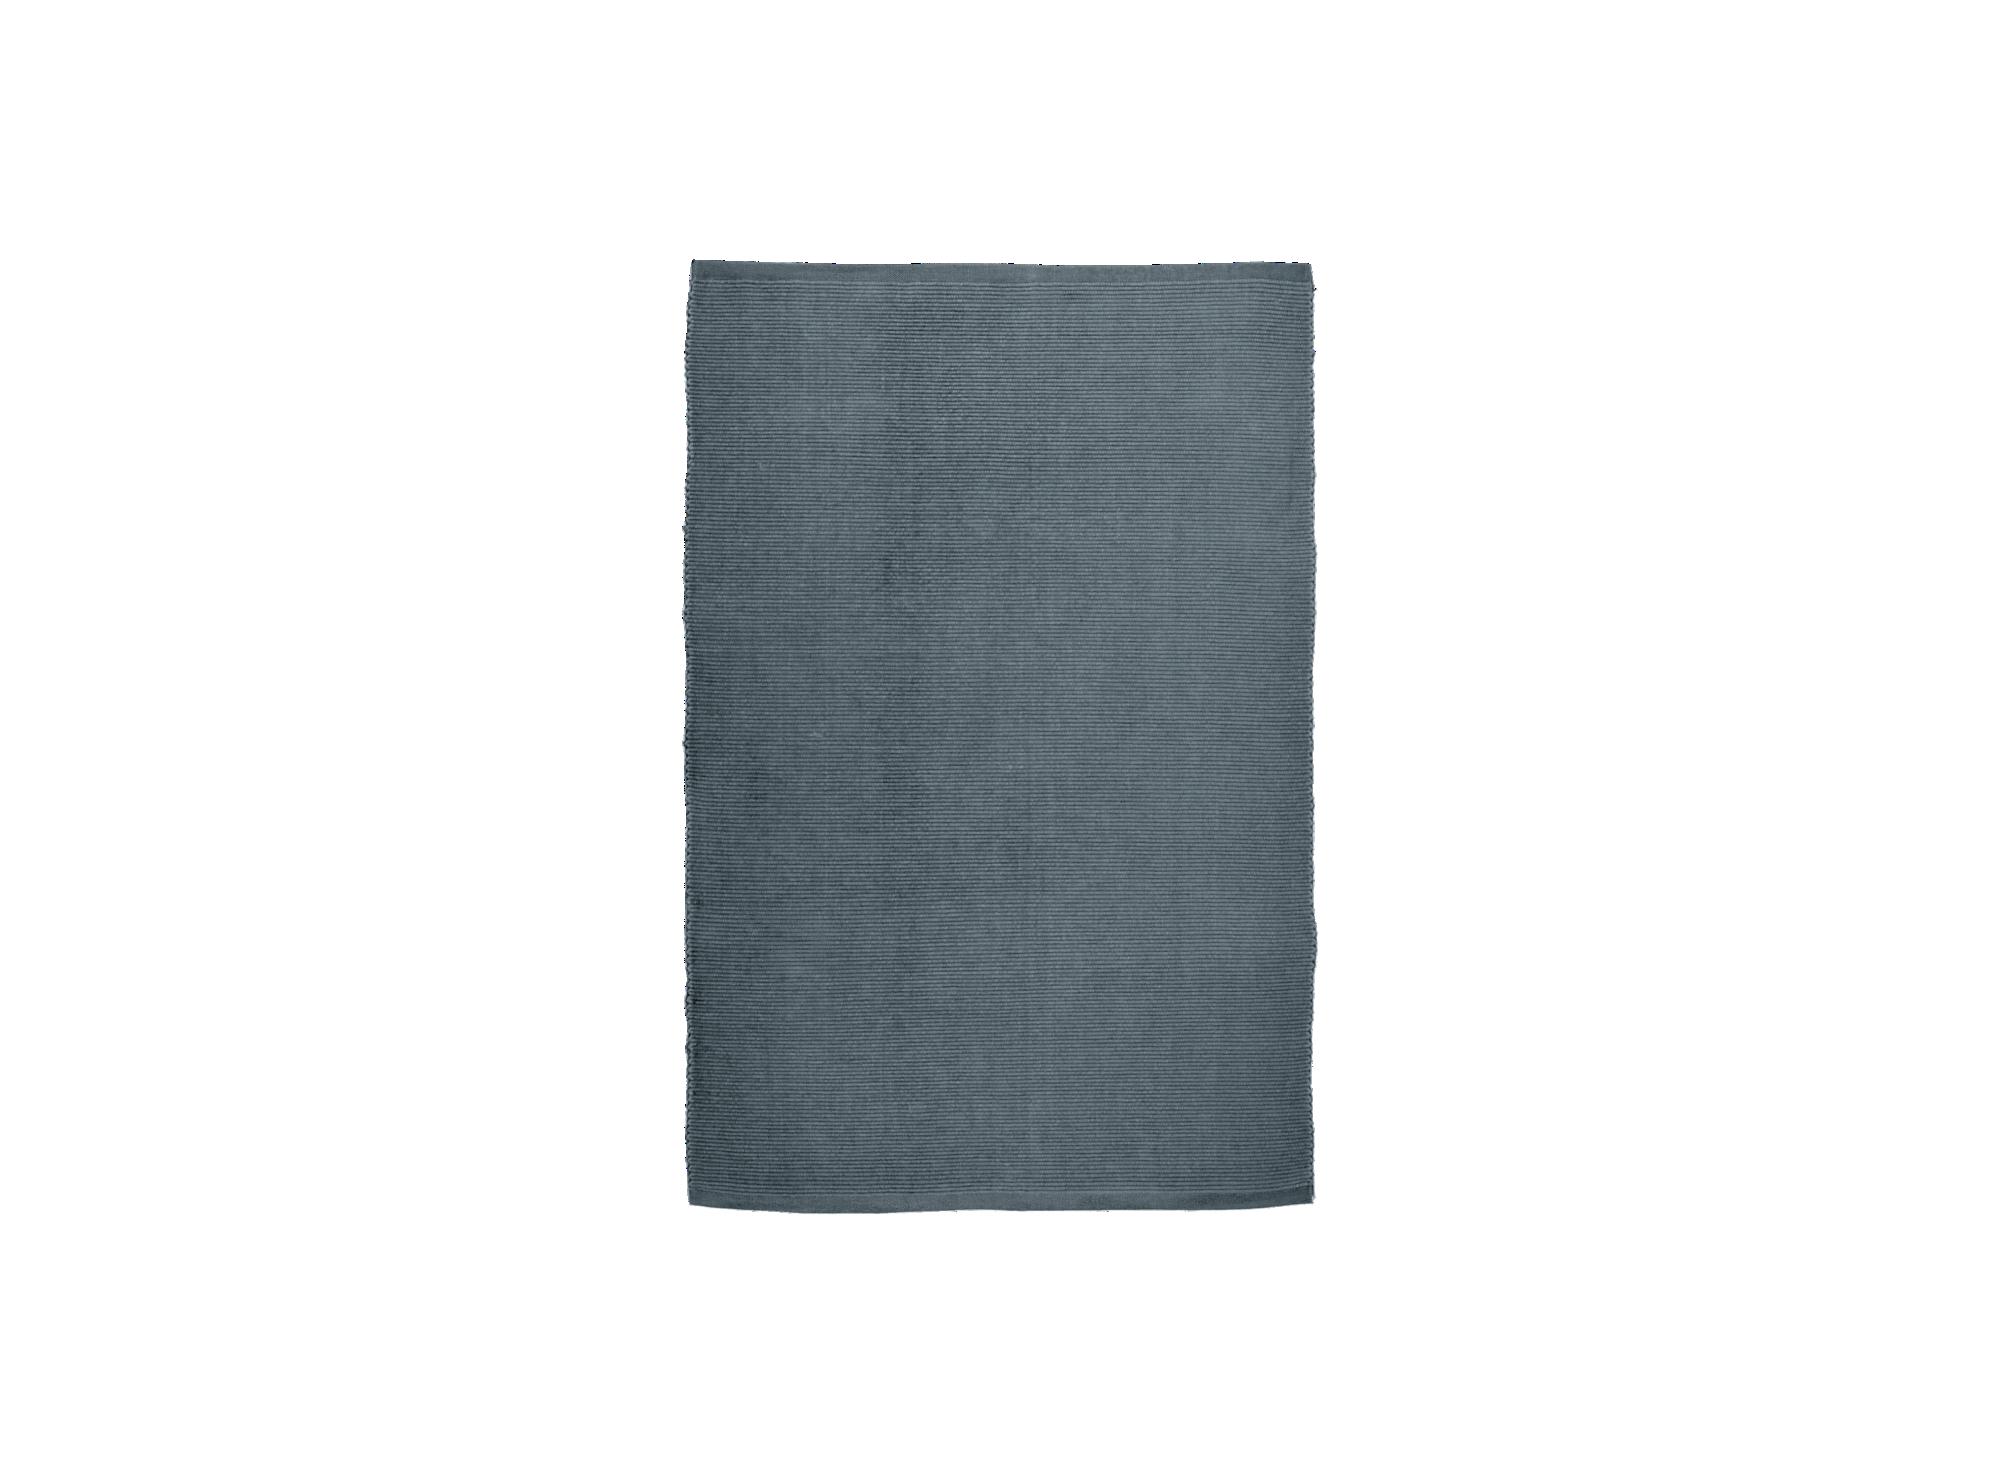 Tapis 60x90 100% coton coloris anthracite densite 950gr/m2 non lavab ...